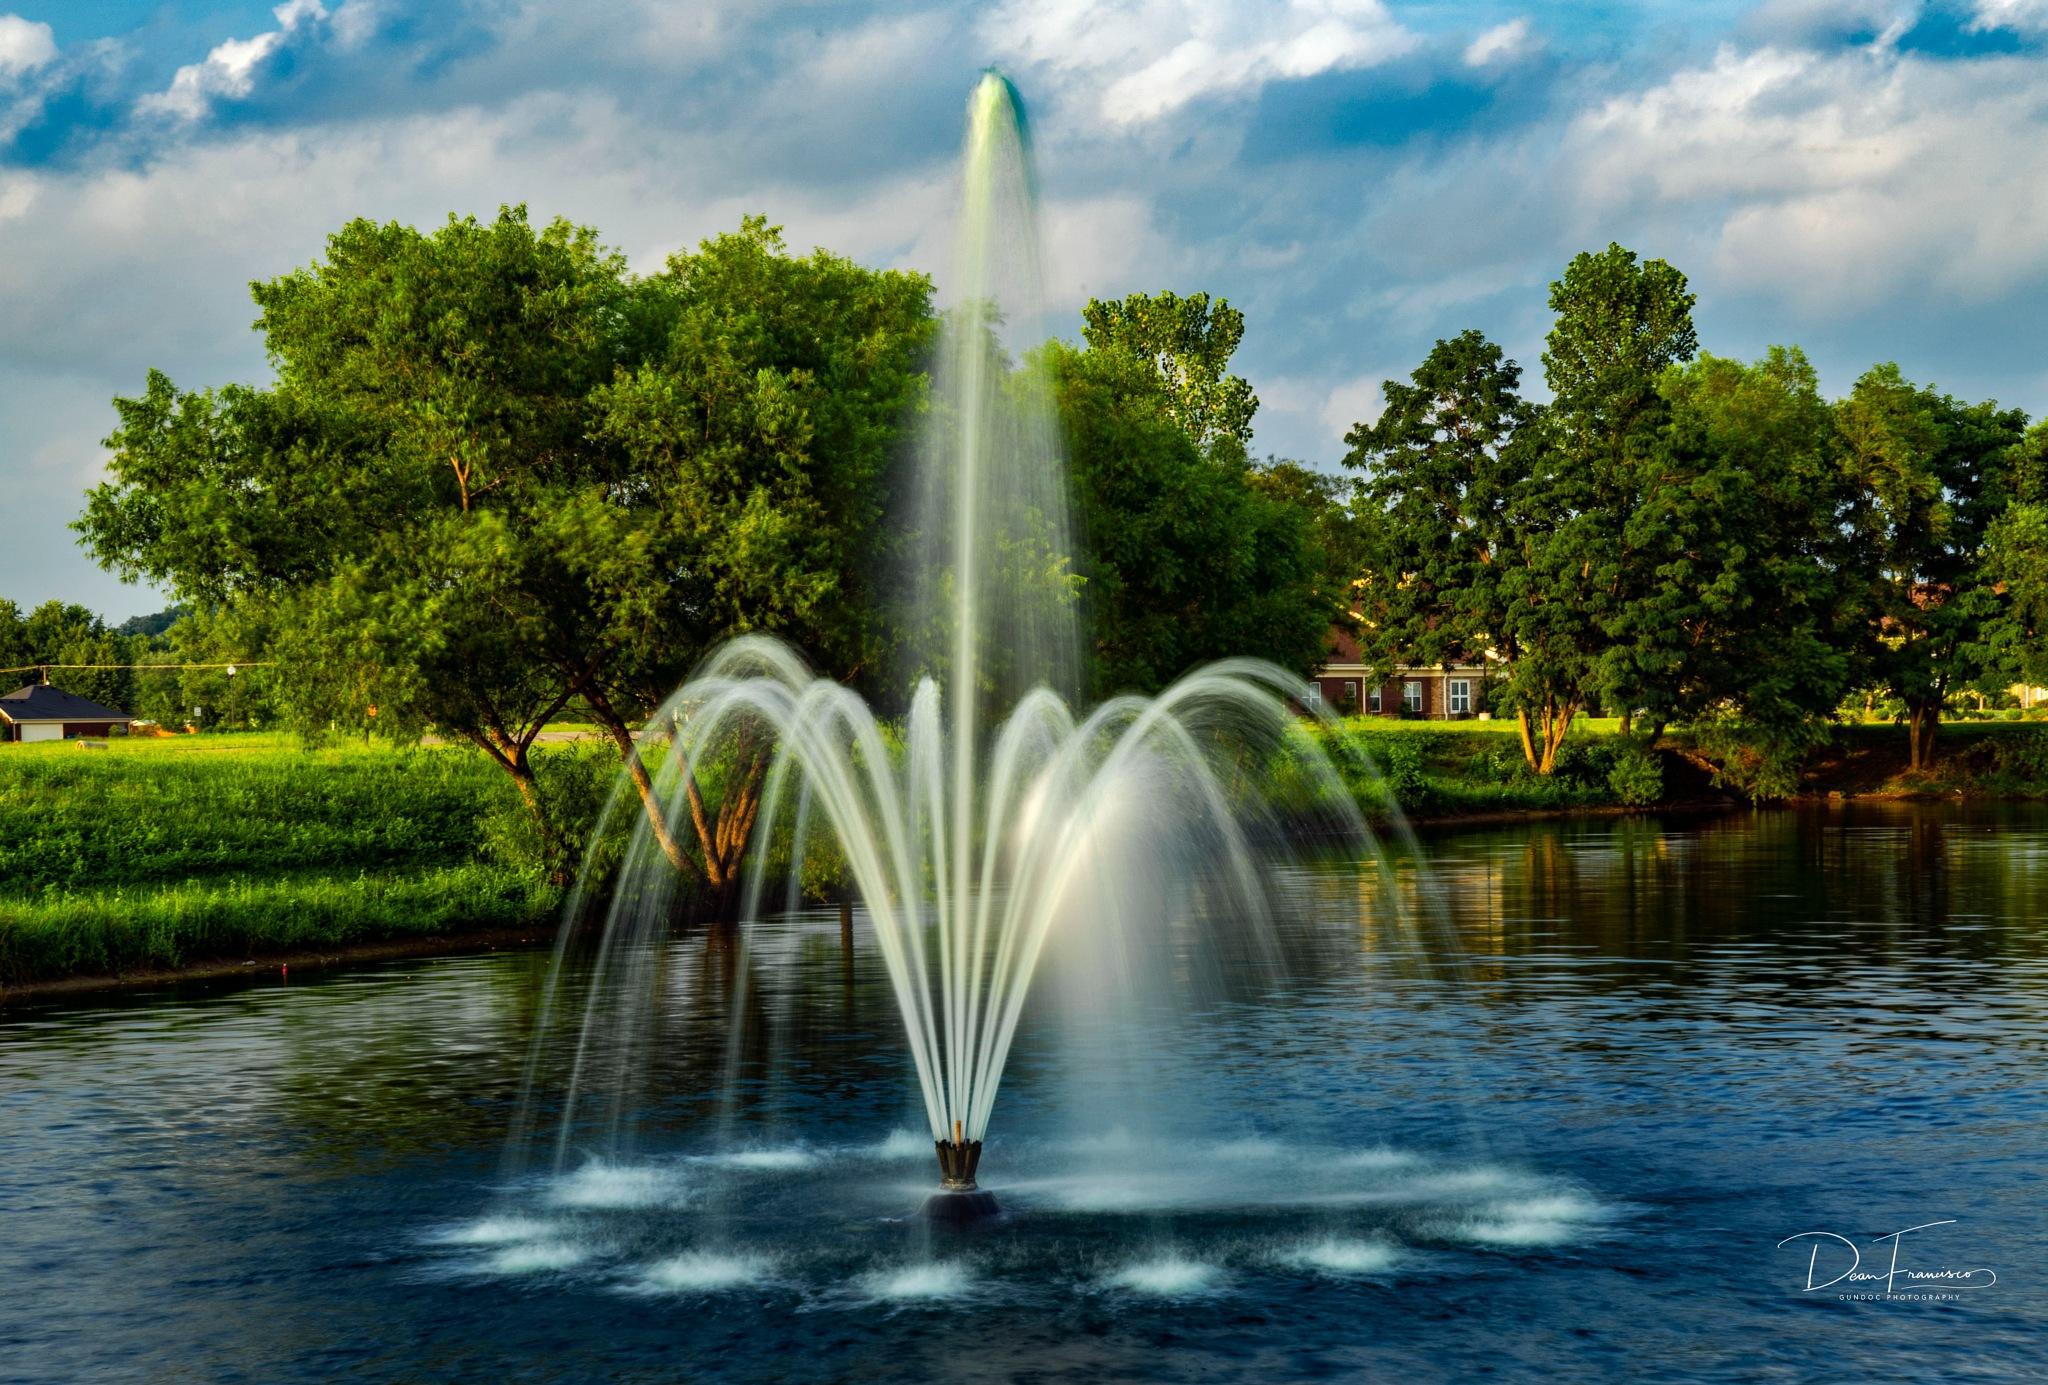 Local subdivision Fountain by Dean Francisco